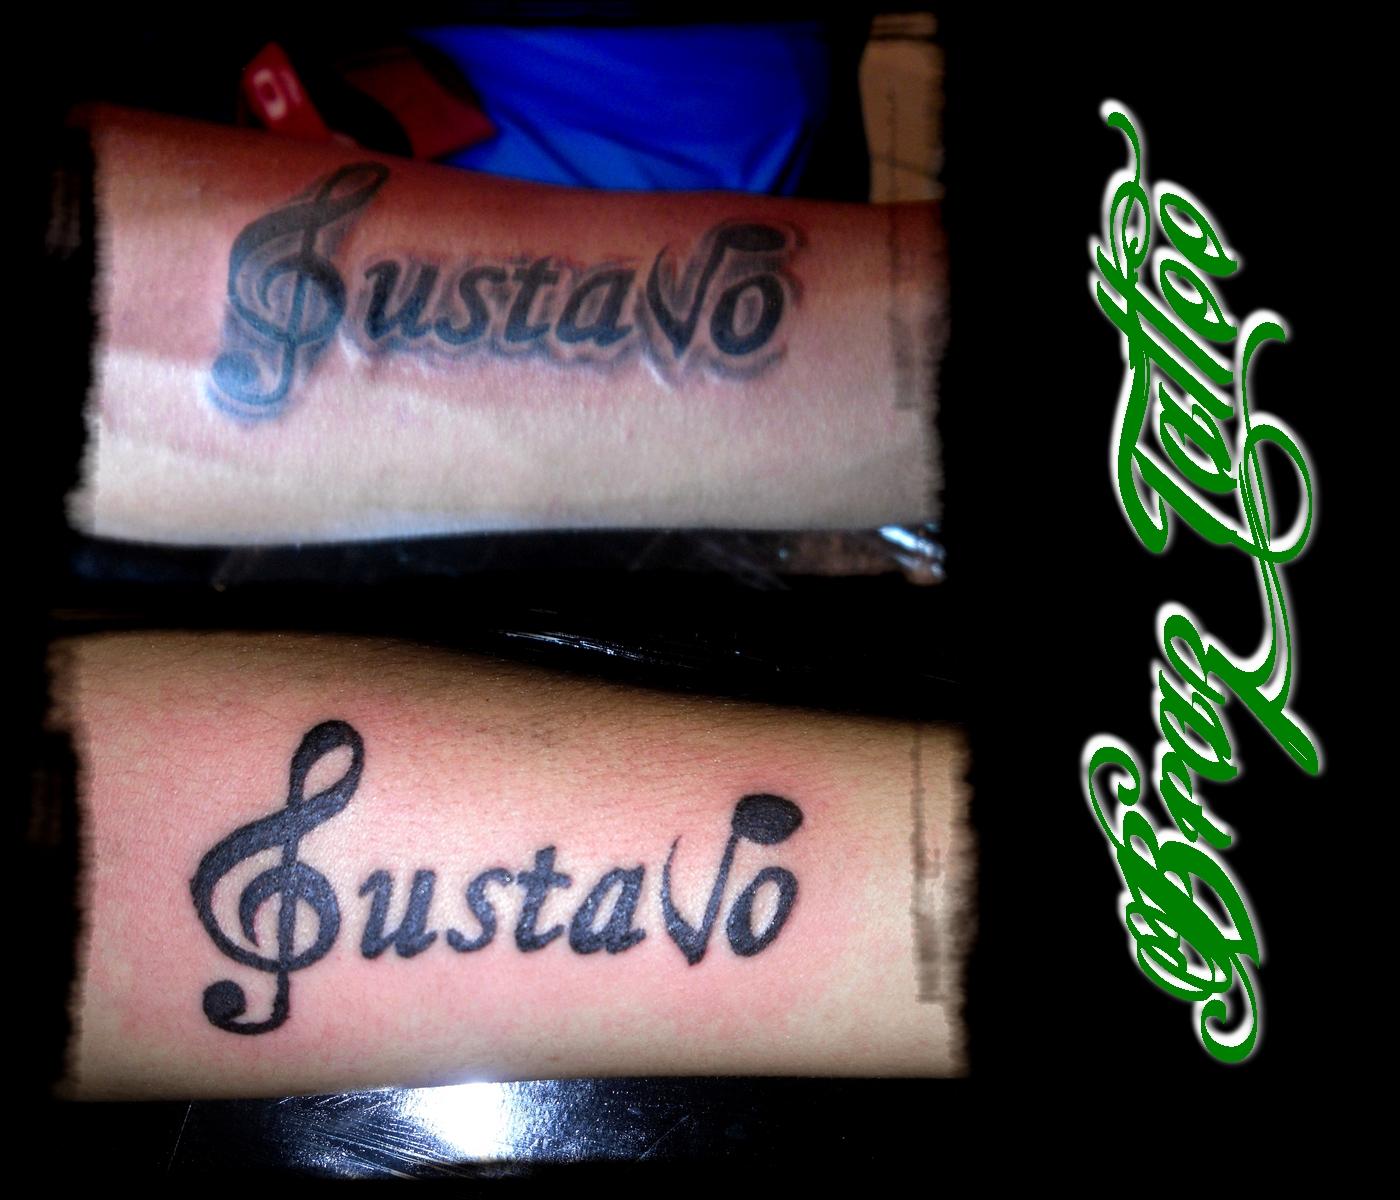 Braz tattoo tatuagem e piercing curso de tatuagem curitiba gustavo altavistaventures Gallery